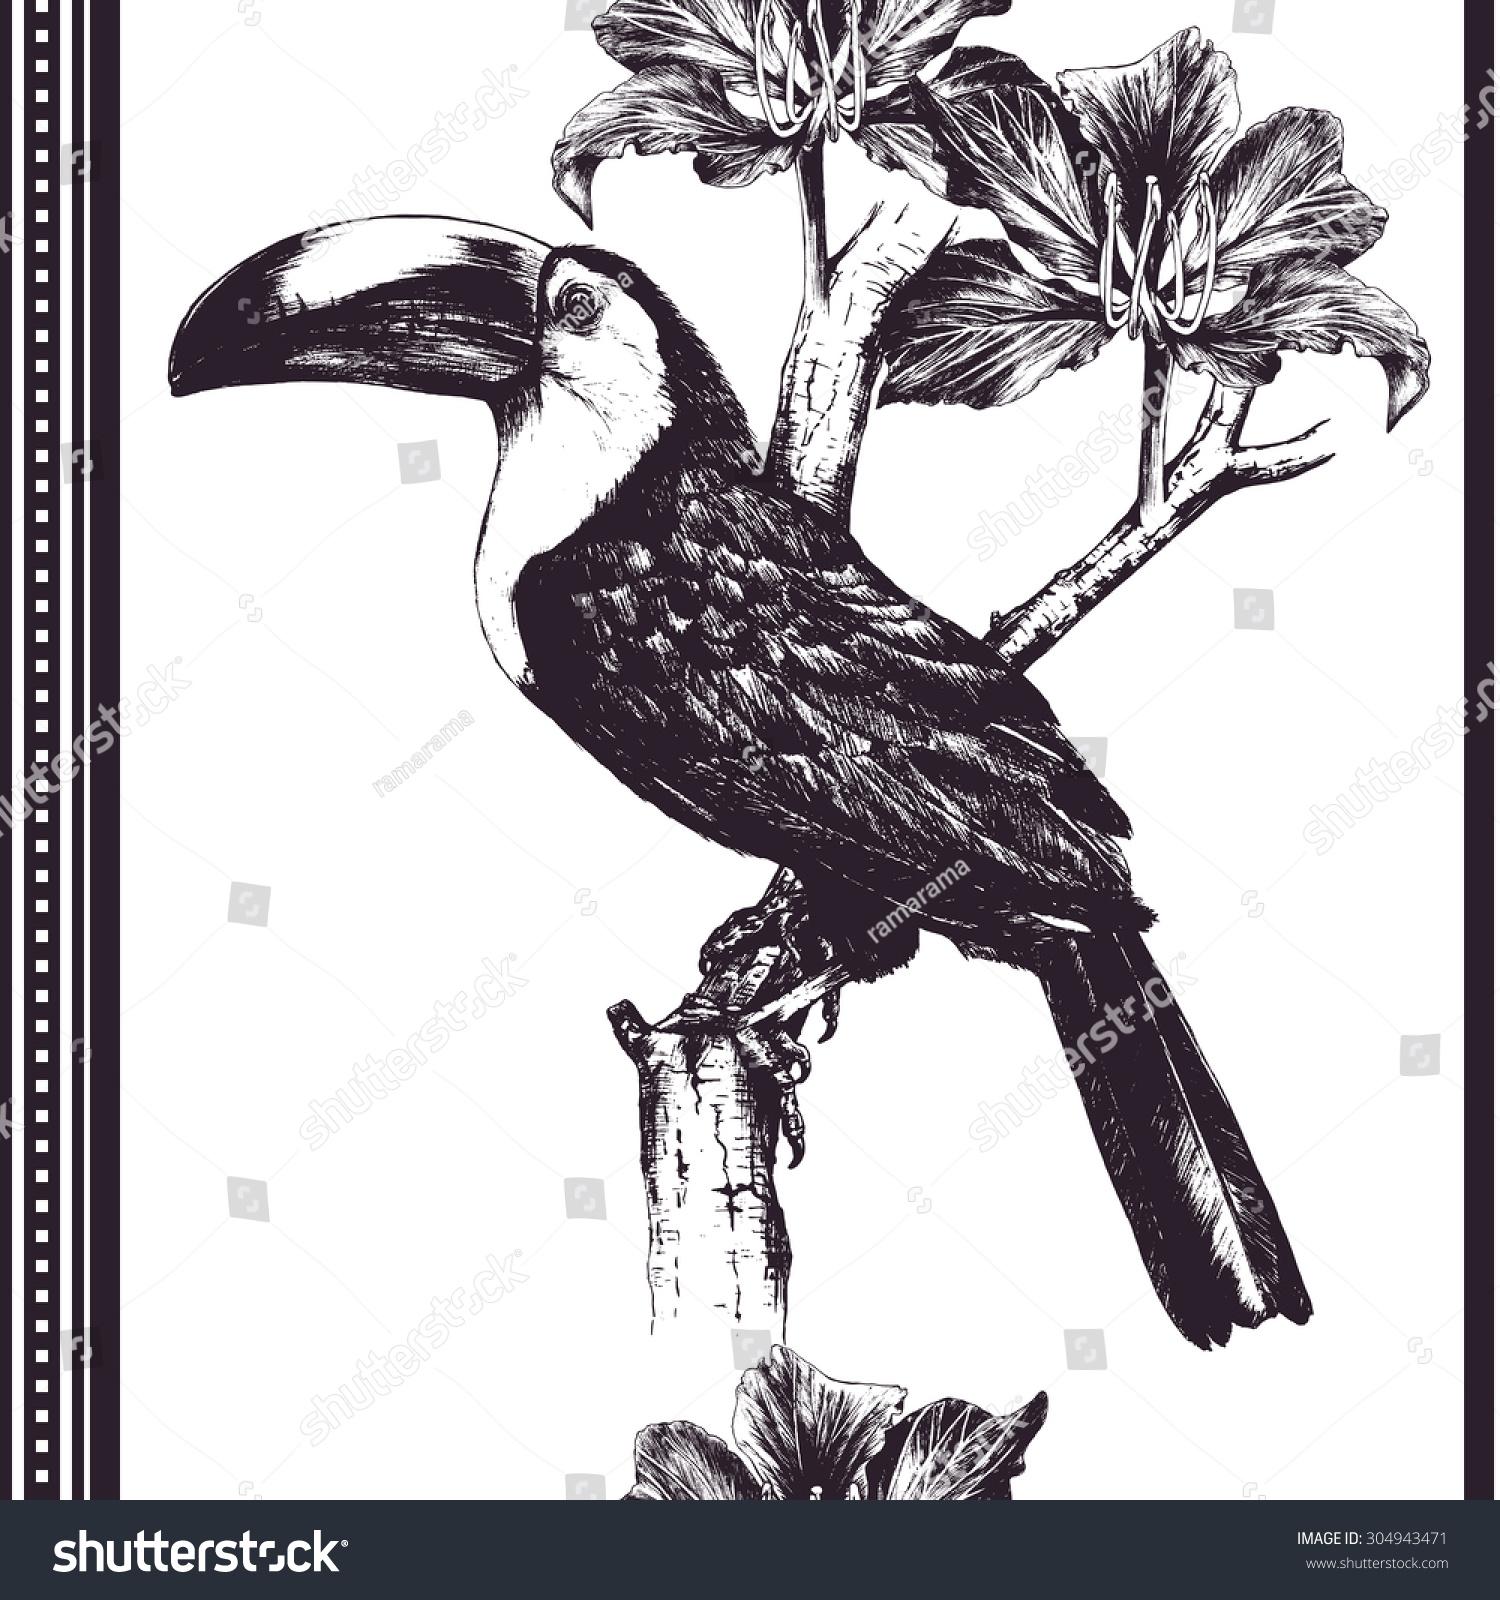 Vector Handdrawn Illustration Graphic Template Wallpaper